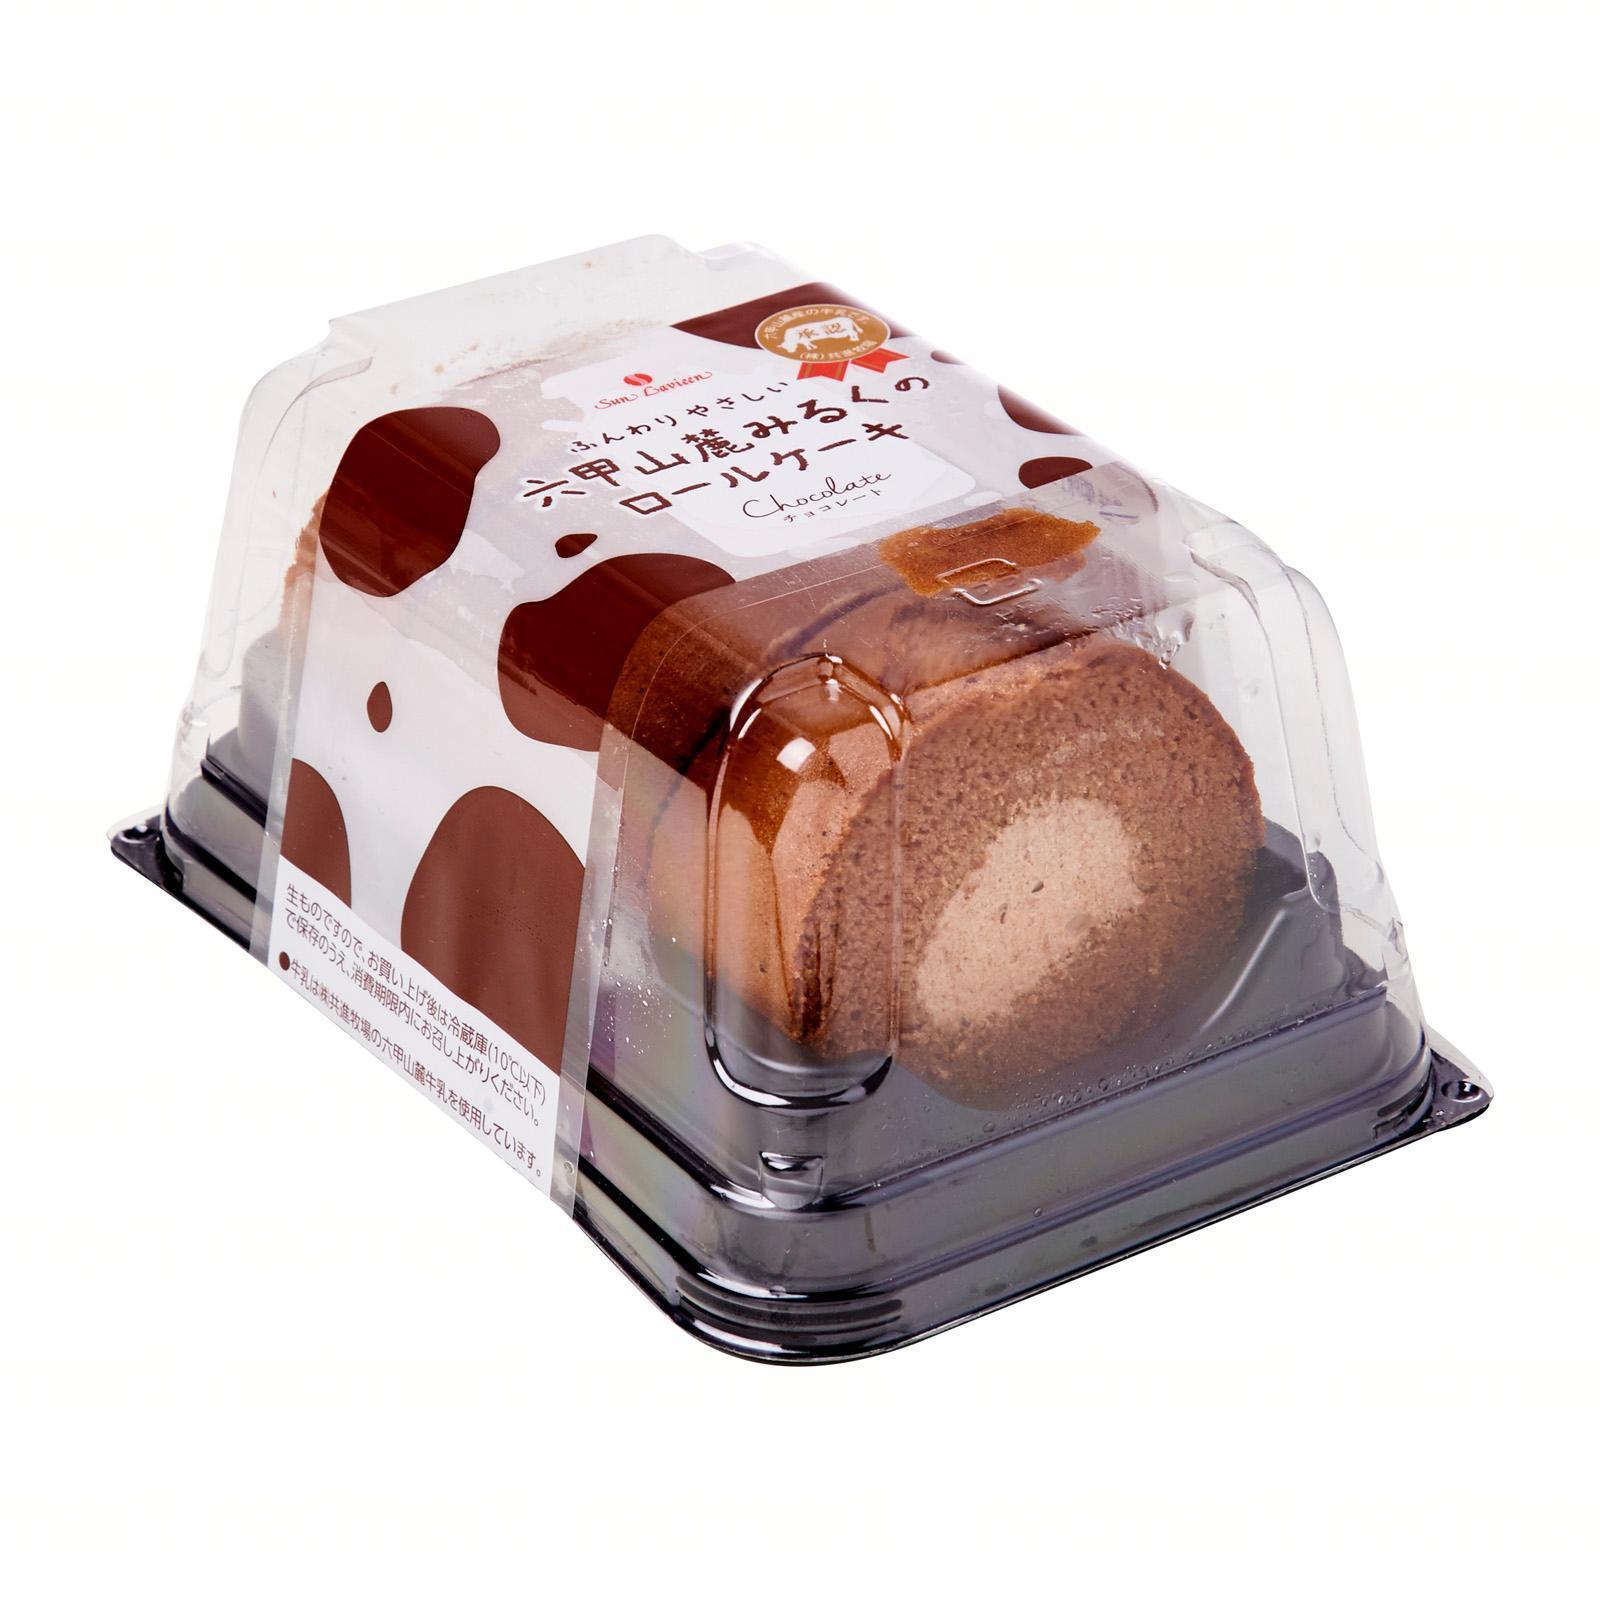 Sunlavieen Rokko Sanroku Milk Chocolate Roll Cake - Frozen - Jetro Special